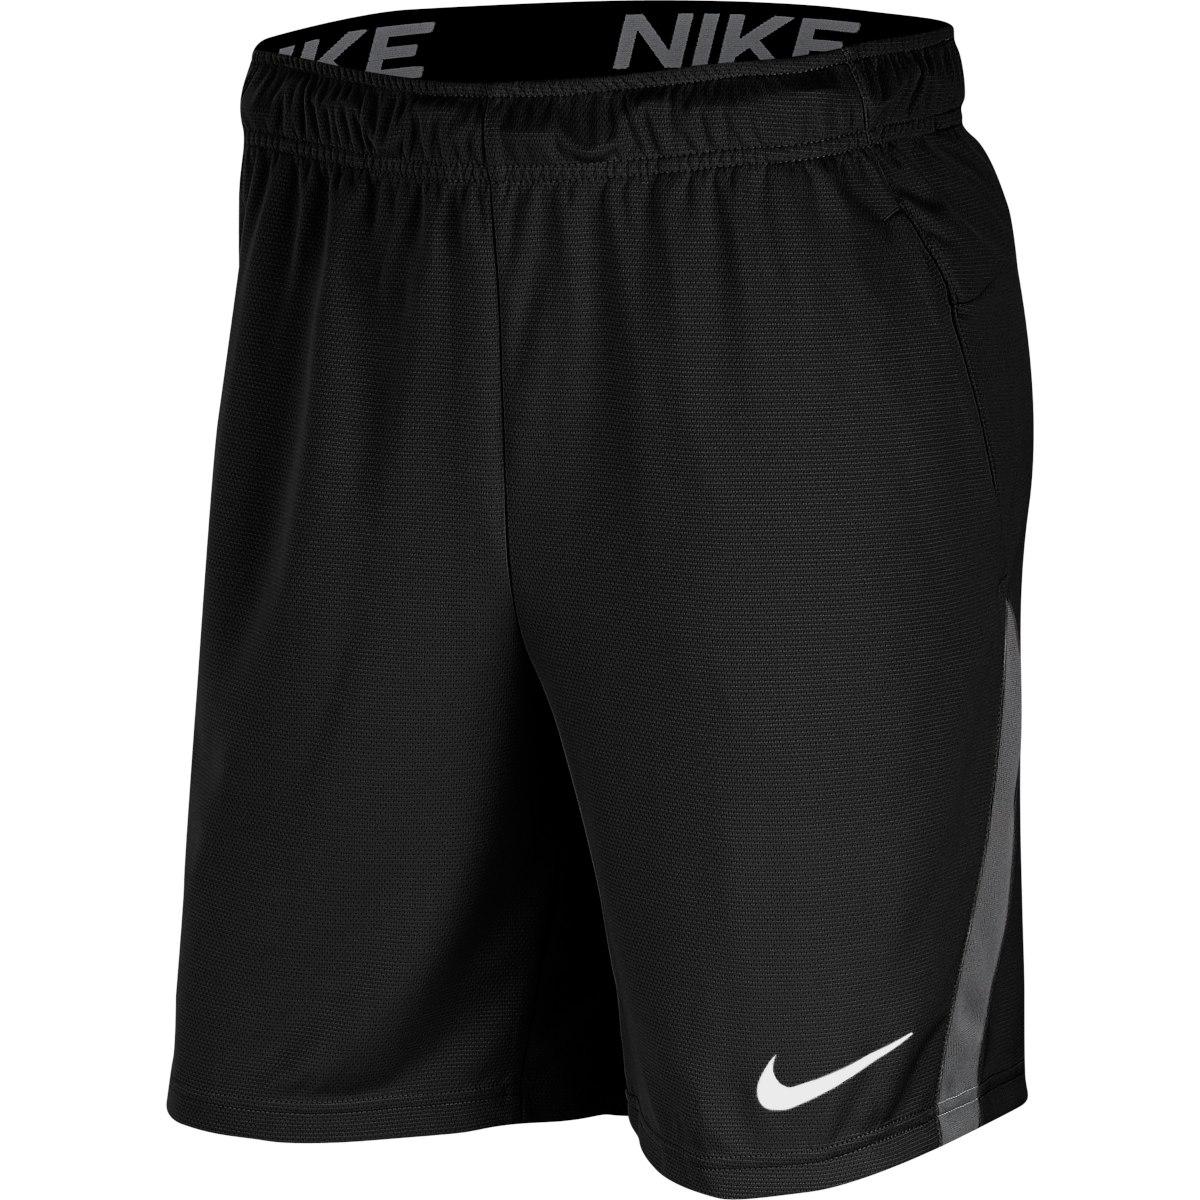 "Foto de Nike Dri-FIT Pantalón corto 9"" de entrenamiento para hombre - black/iron grey/white CJ2007-010"